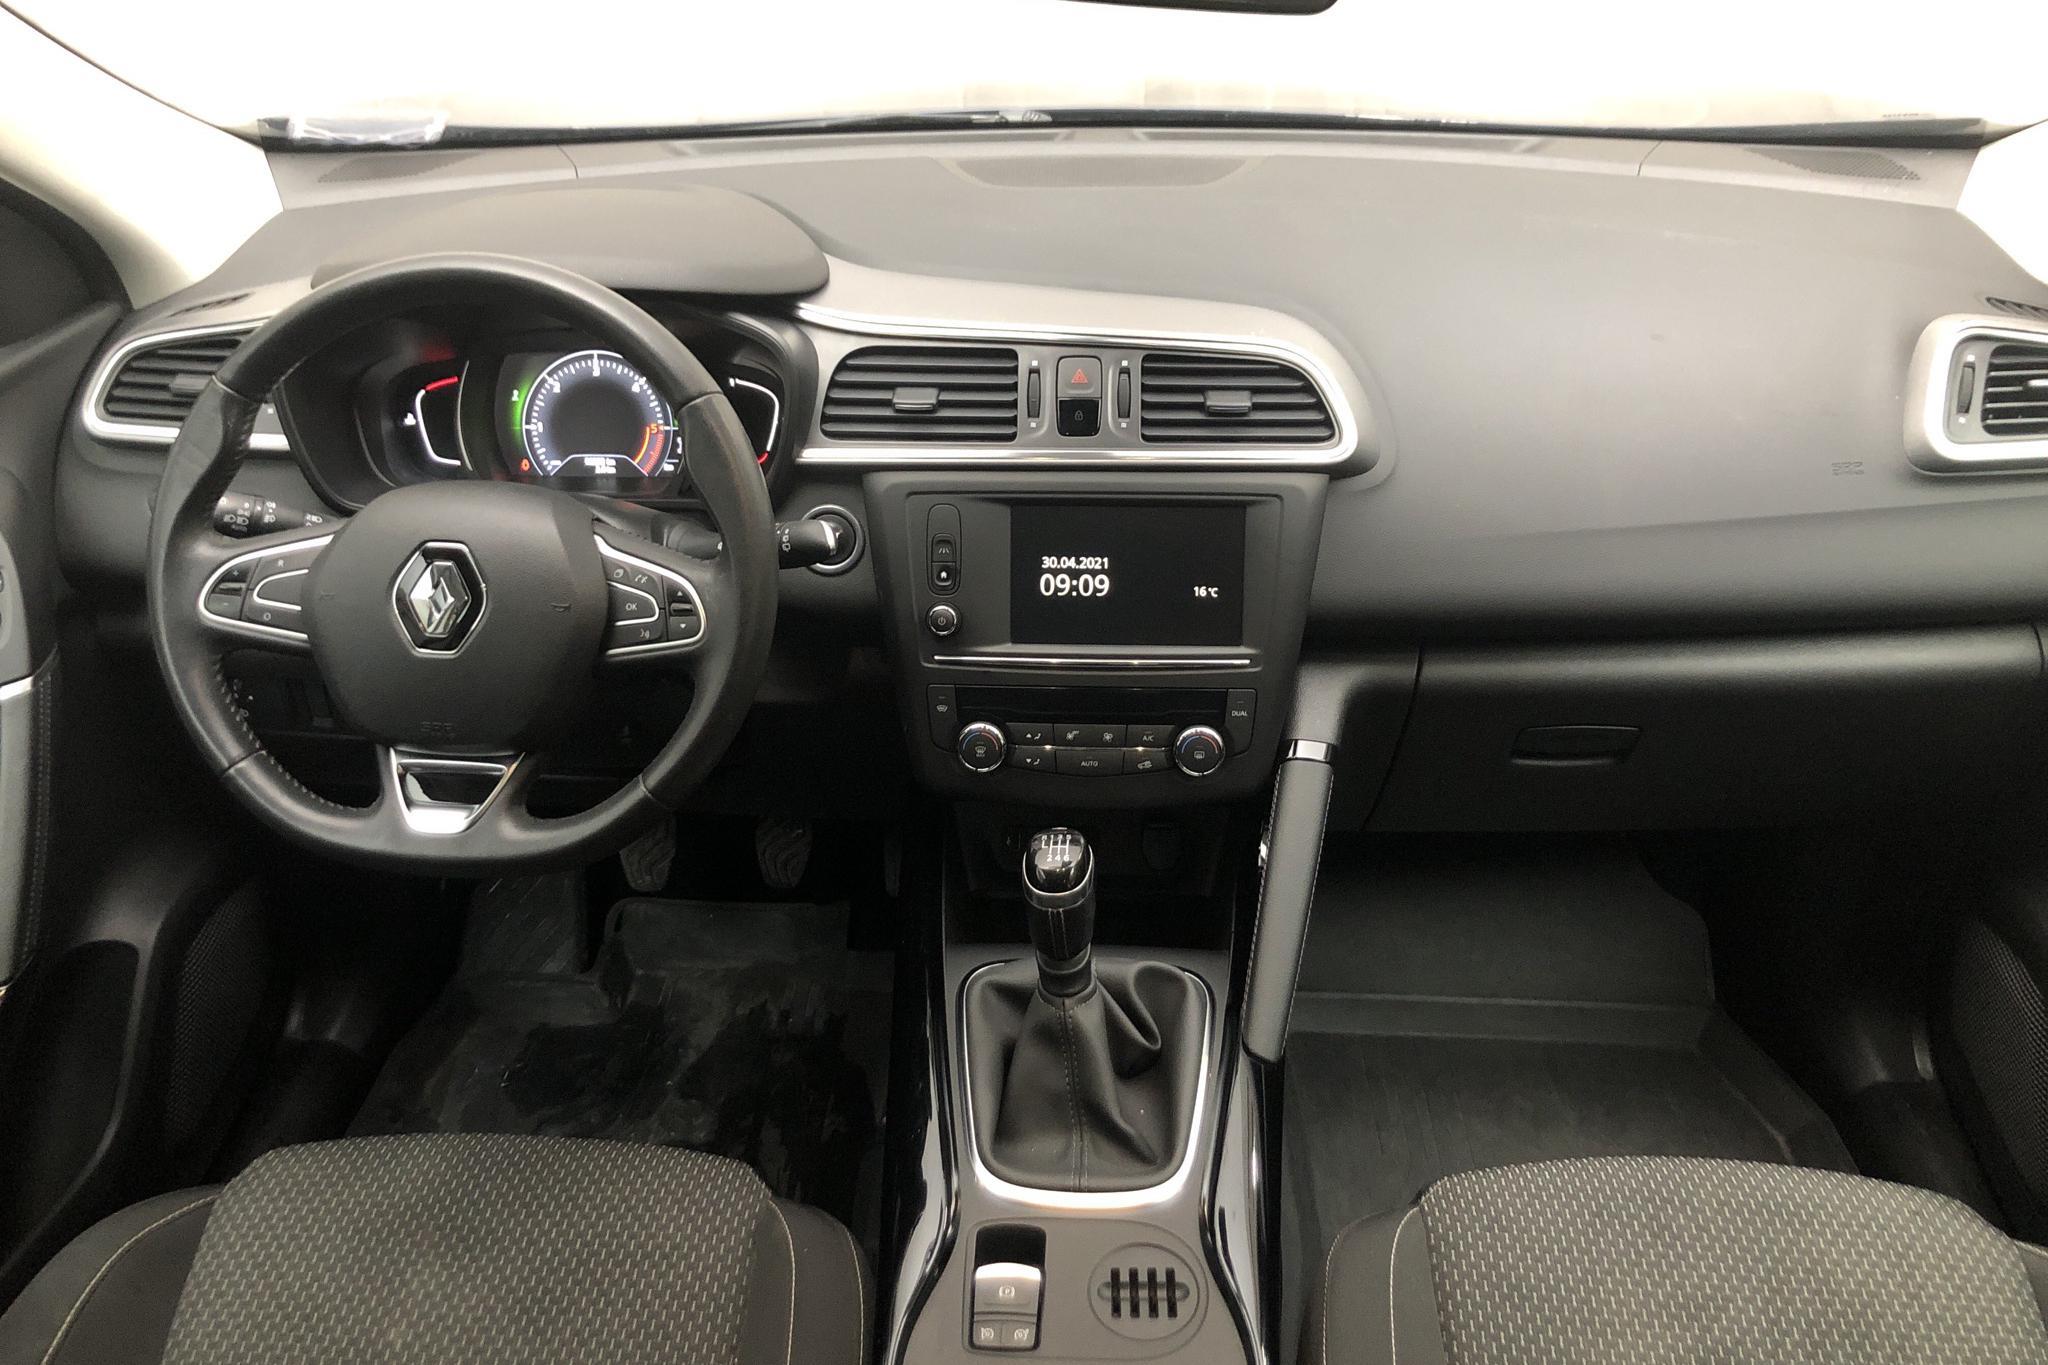 Renault Kadjar 1.5 dCi (110hk) - 98 230 km - Manual - blue - 2016